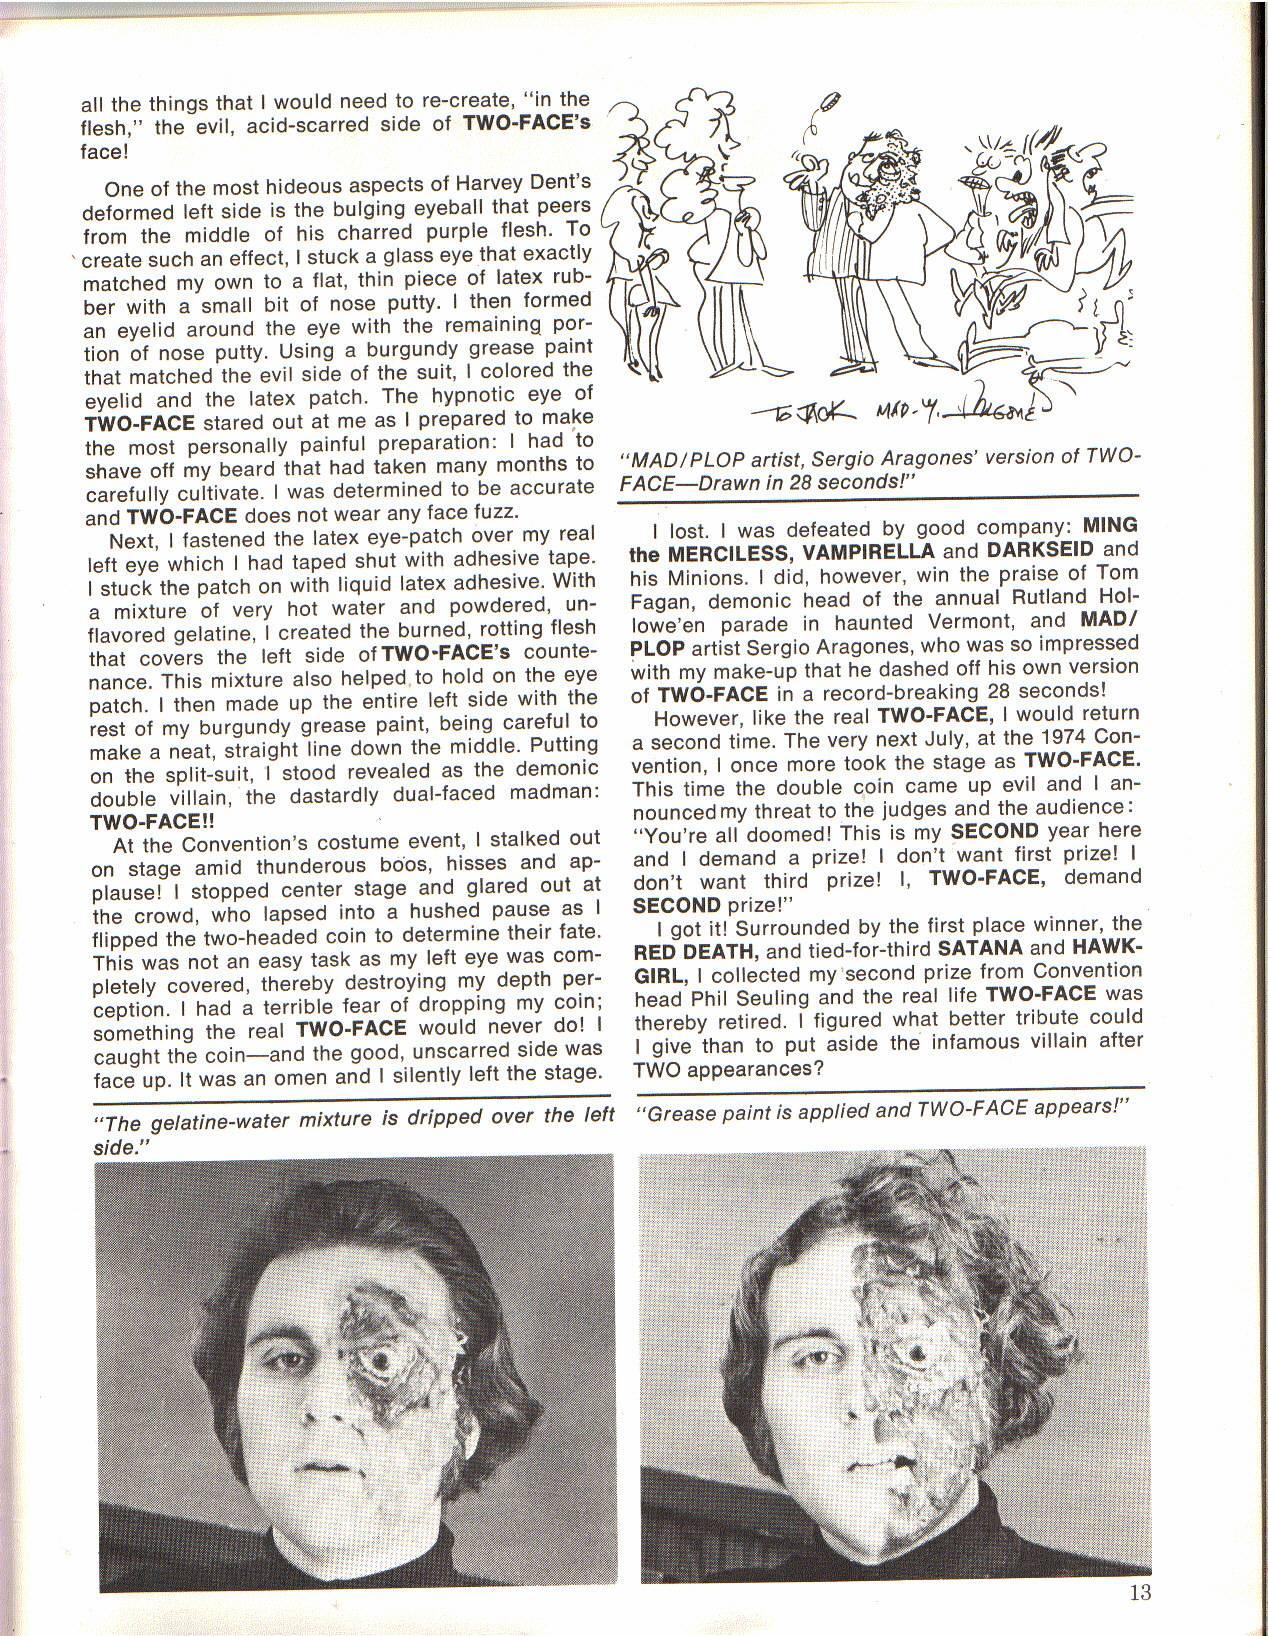 Amazing World of DC Comics (1974) #4 pg.13